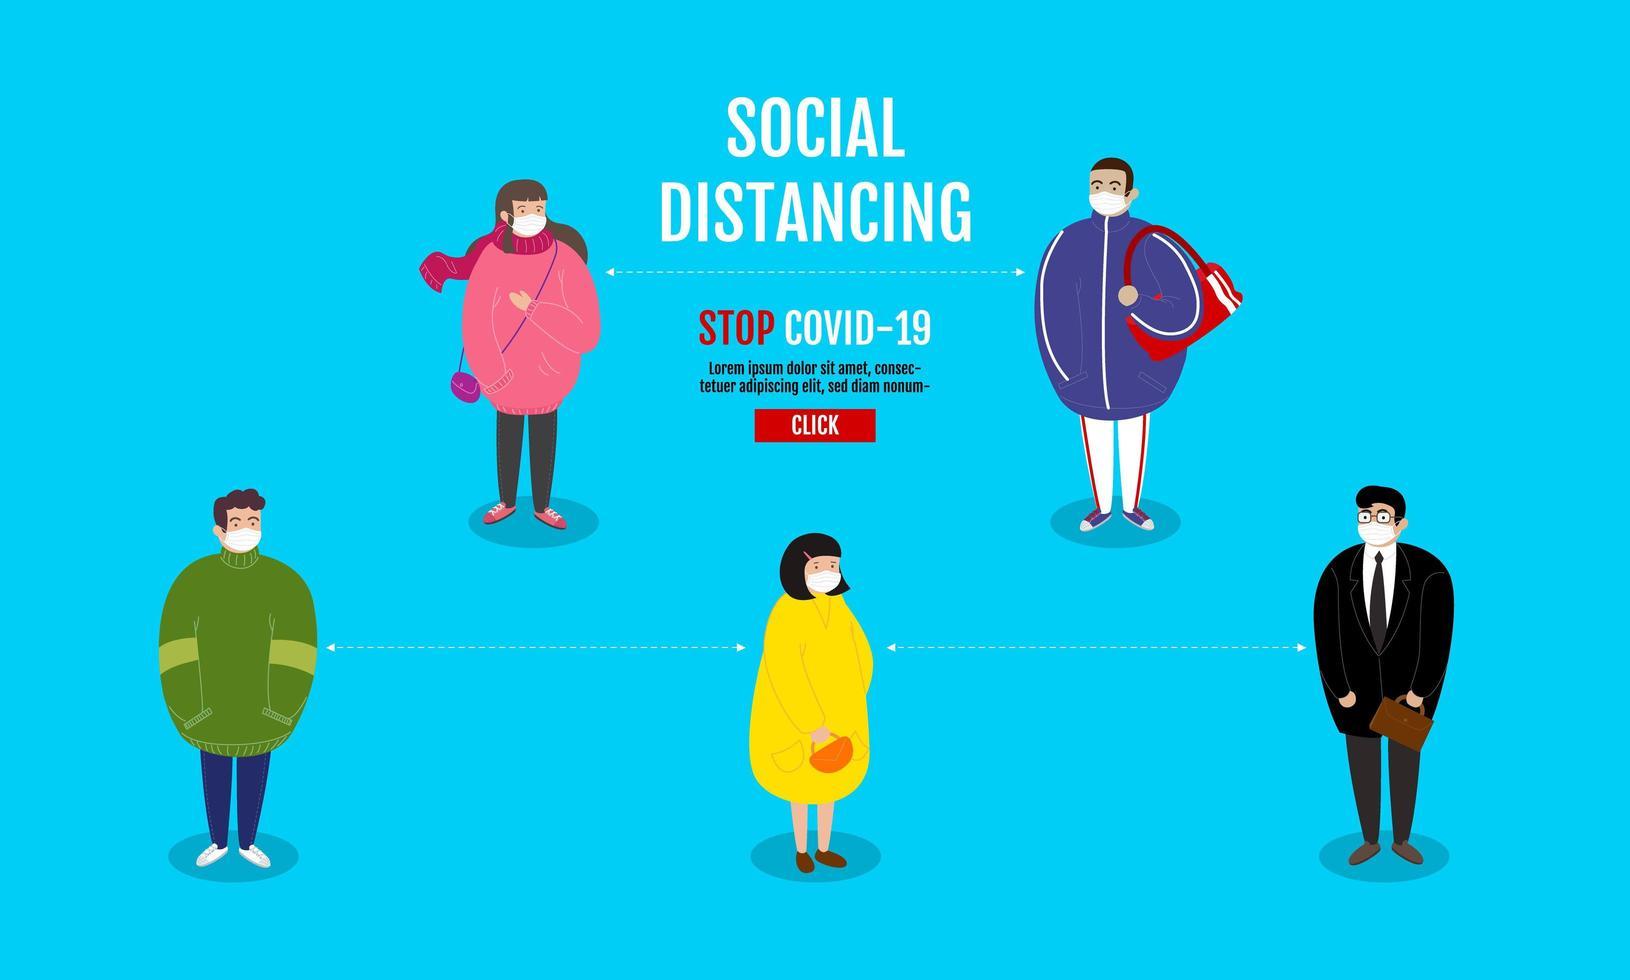 groep tekens die sociale afstand uitoefenen vector